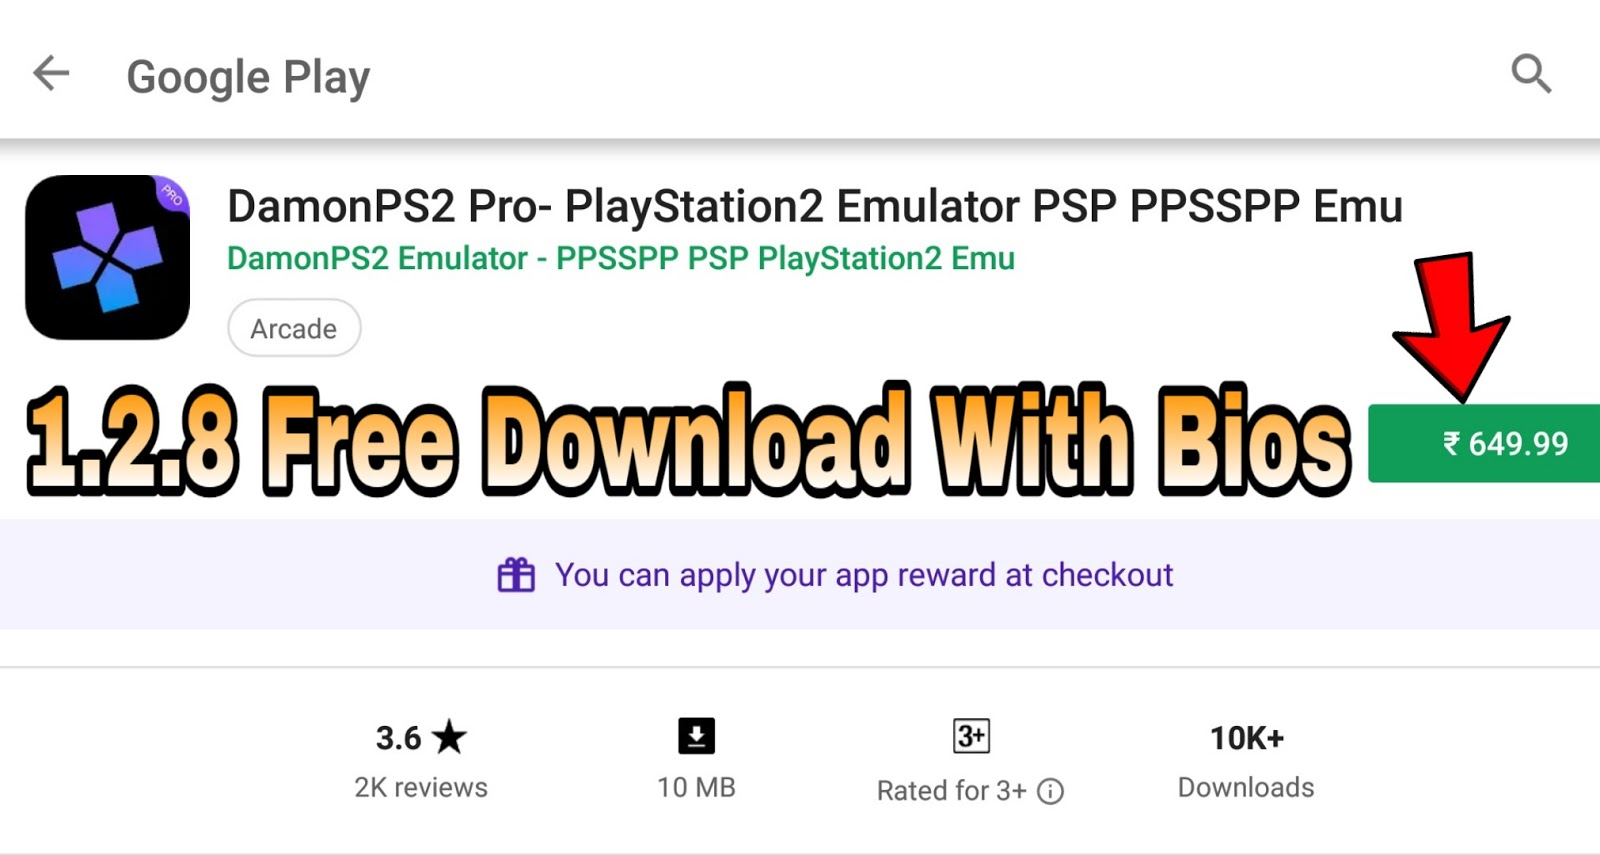 damon ps2 pro emulator bios